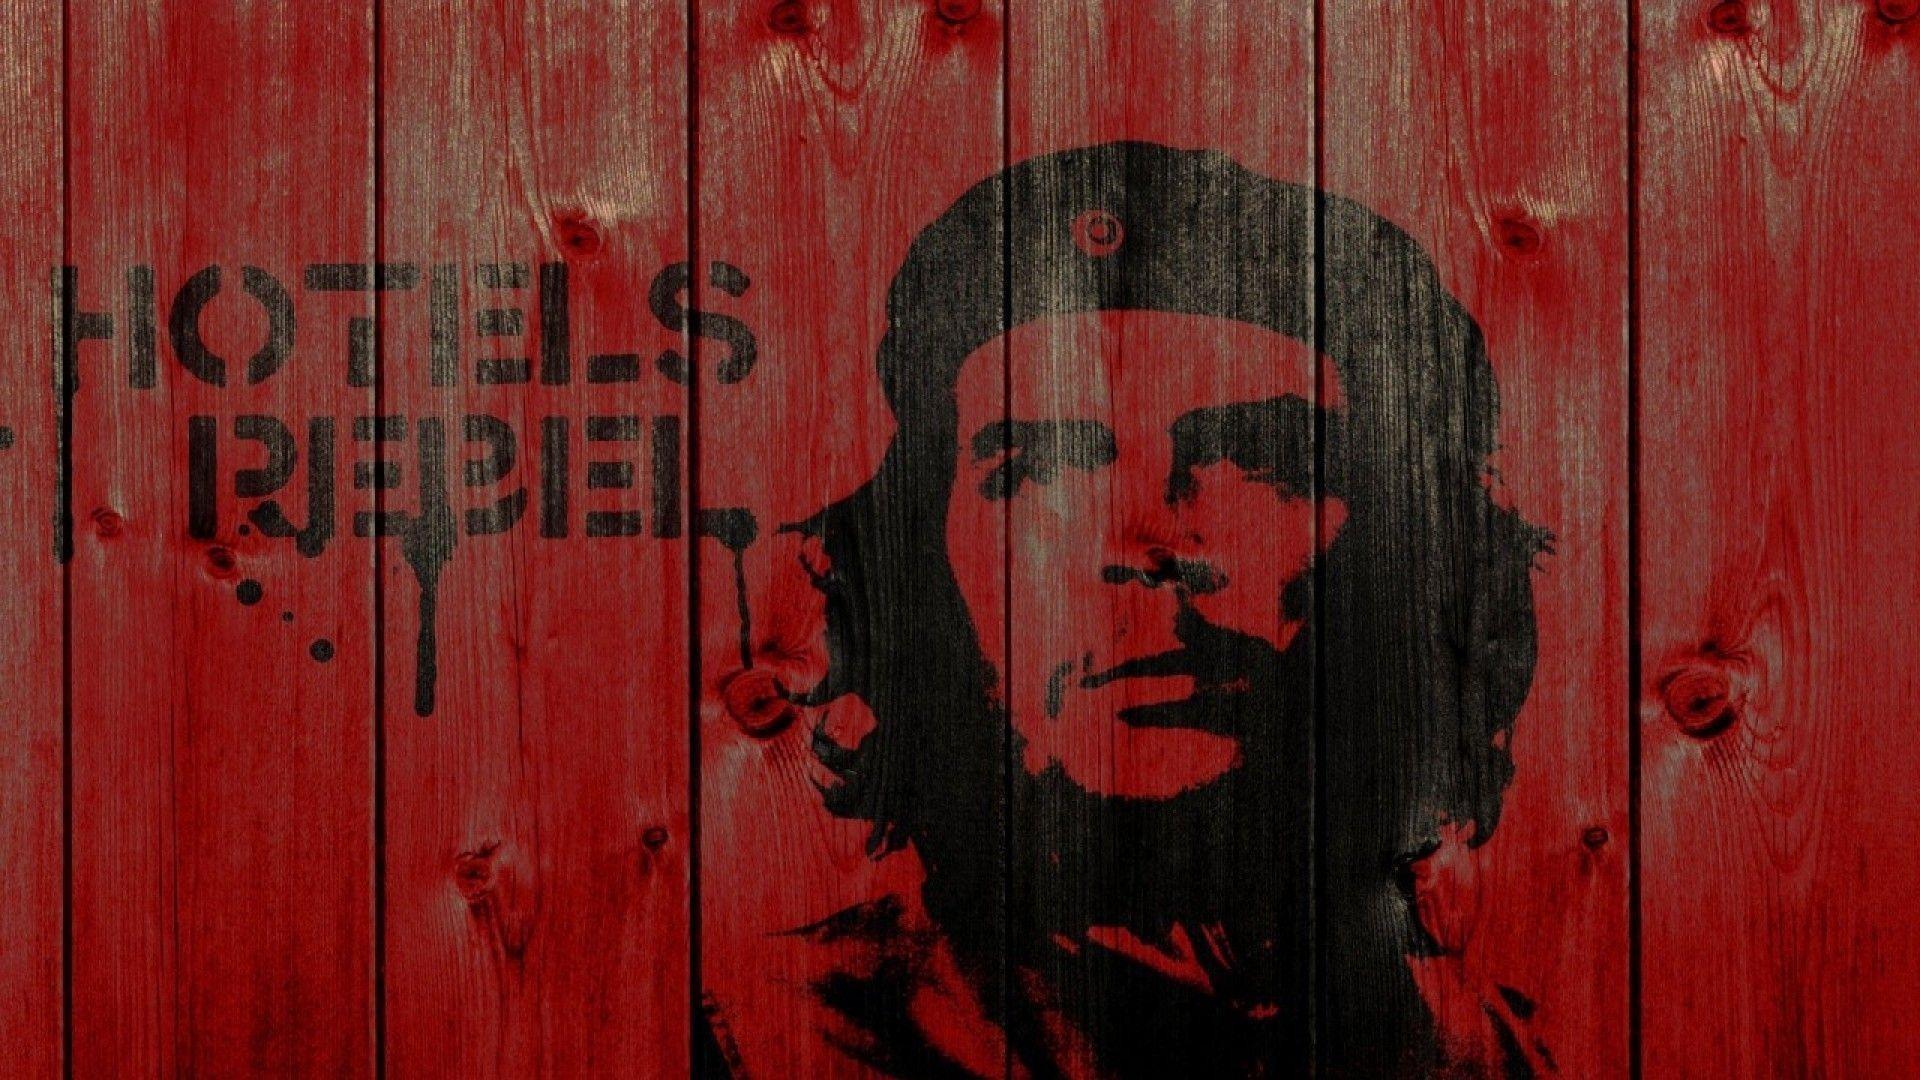 PreviousNext. Previous Image Next Image. che guevara wallpapers 2011